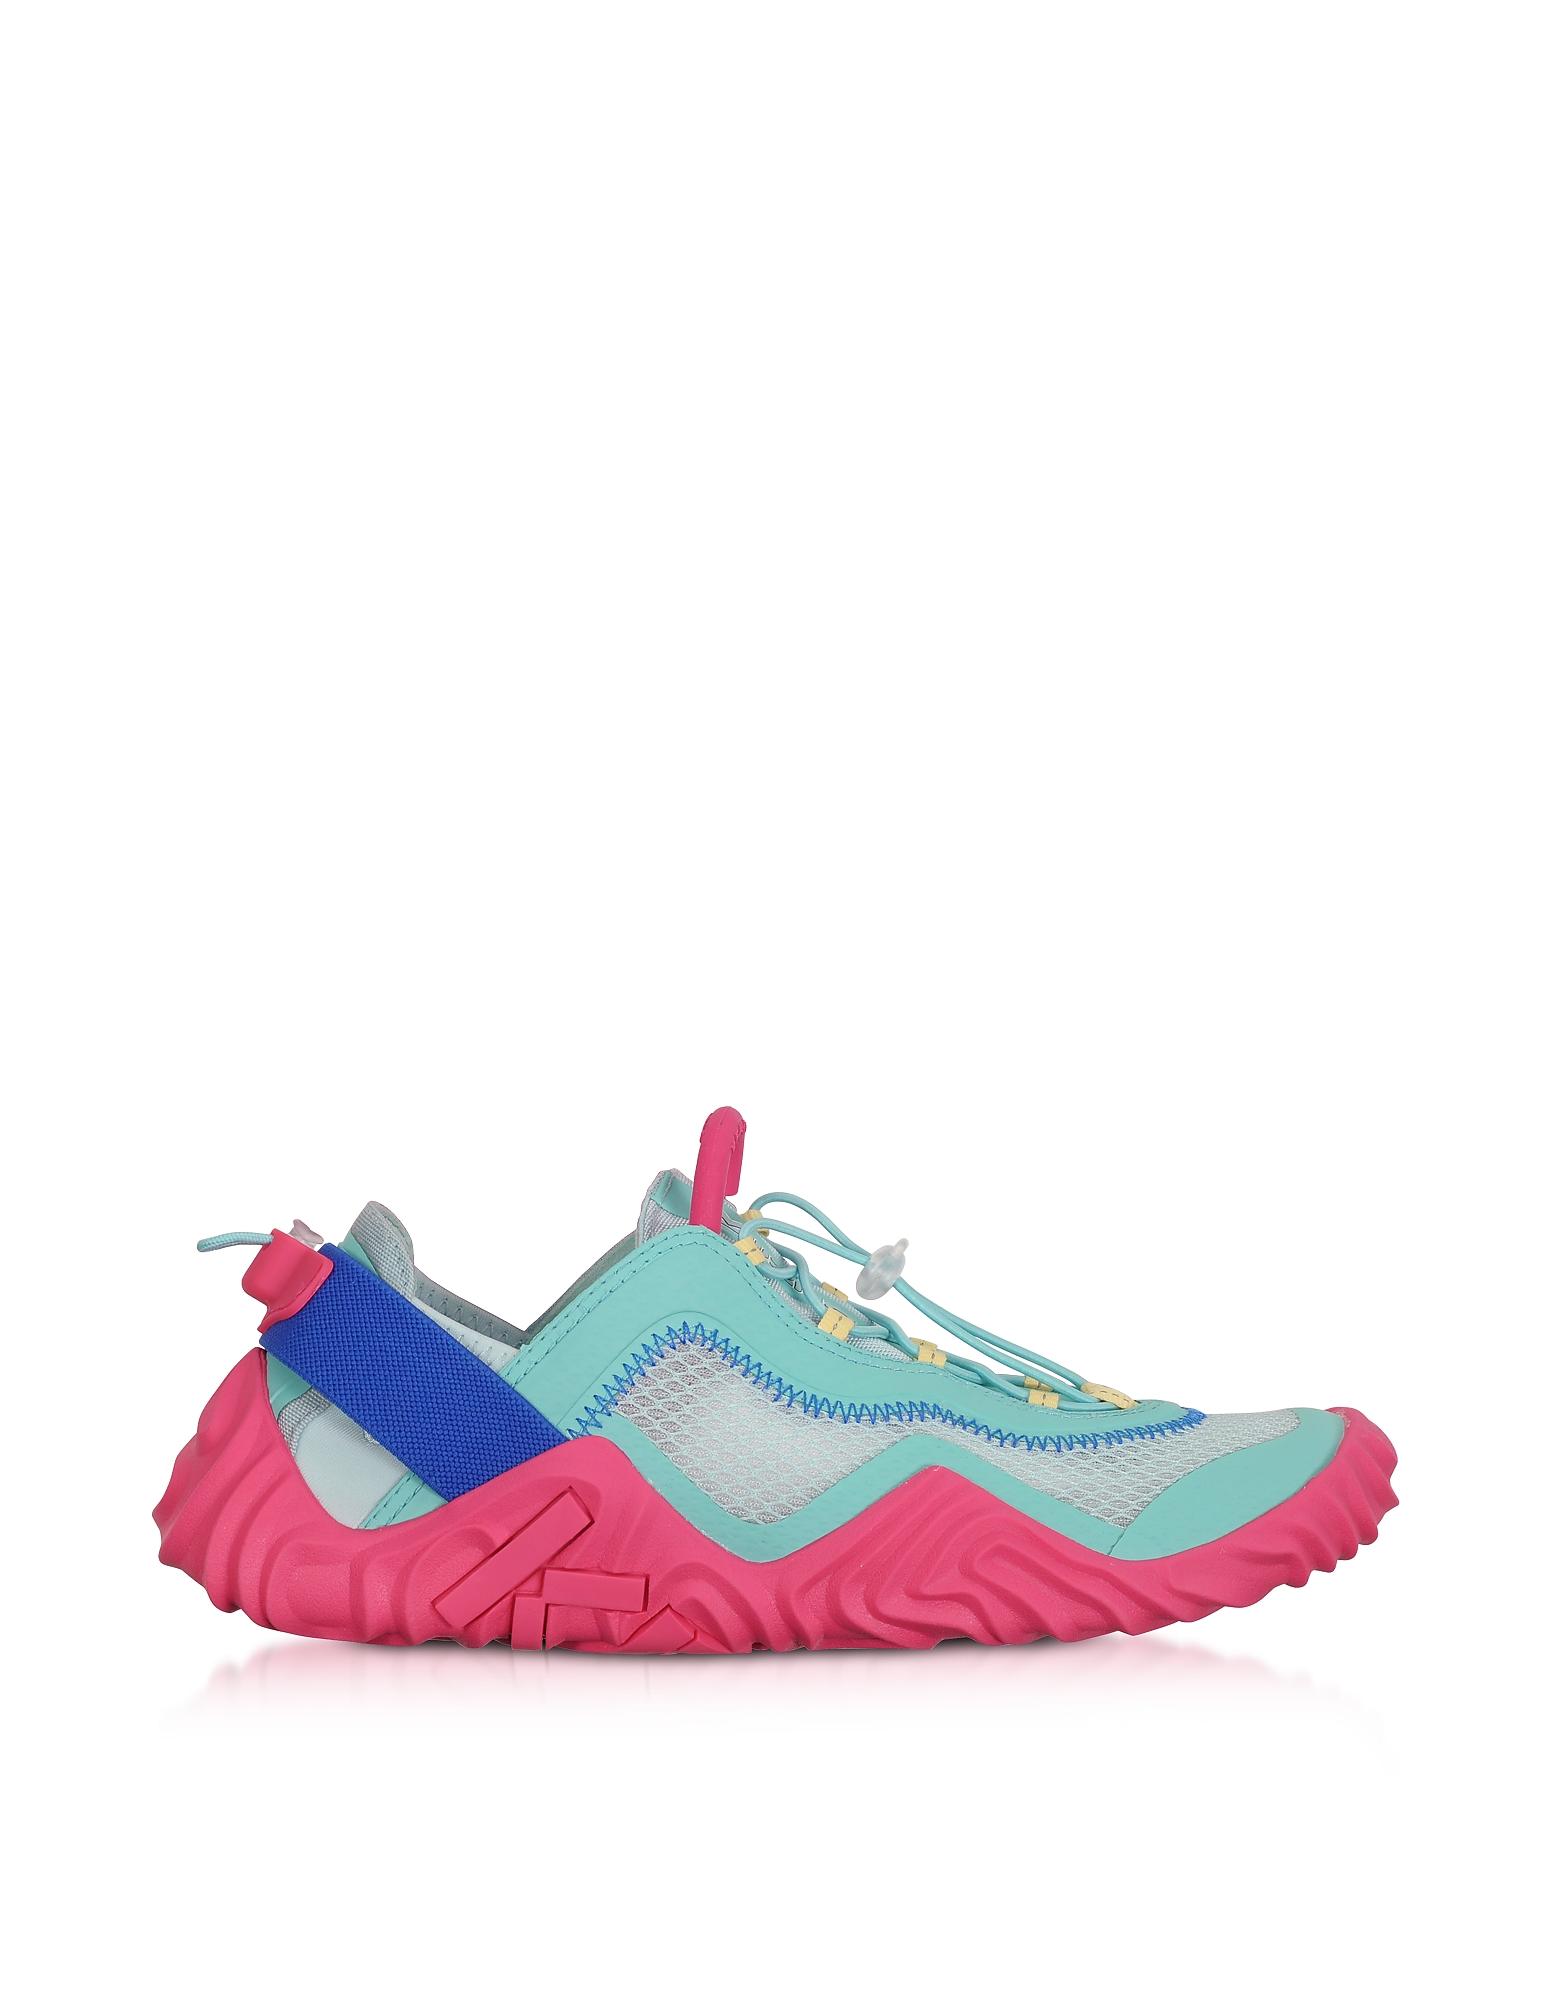 Kenzo Designer Shoes, Aqua Mesh Kenzo Wave Low Top Sneakers